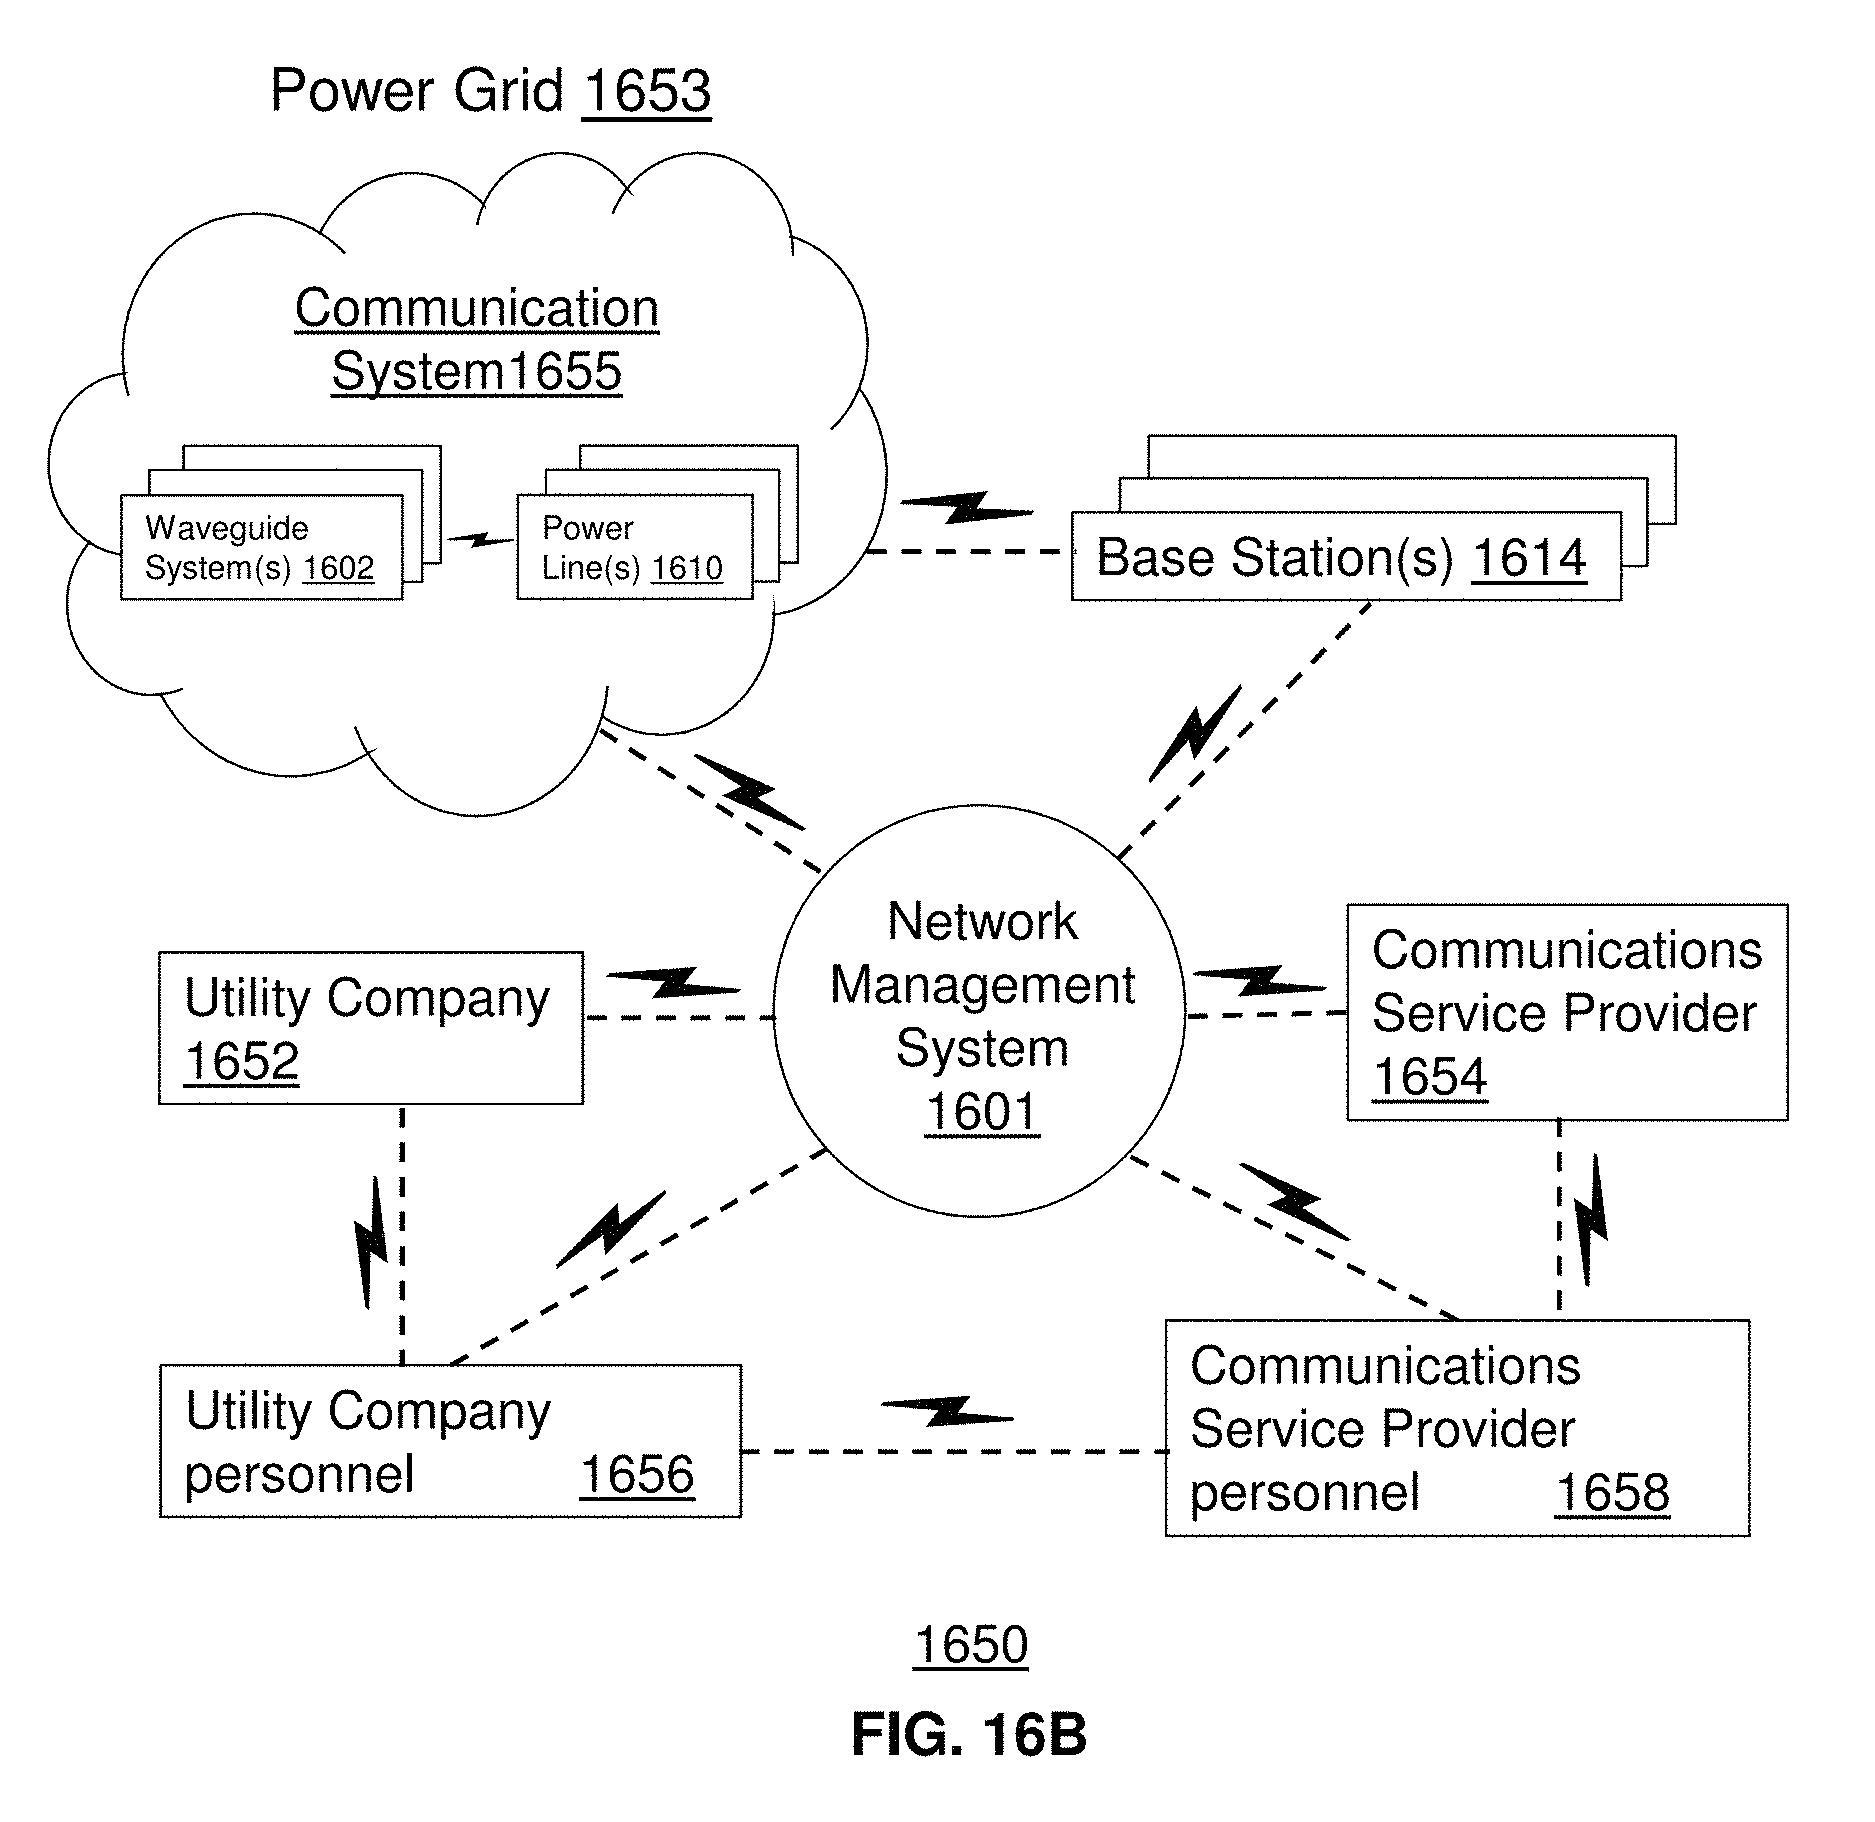 us9742462b2 transmission medium and communication interfaces and rh patents google com